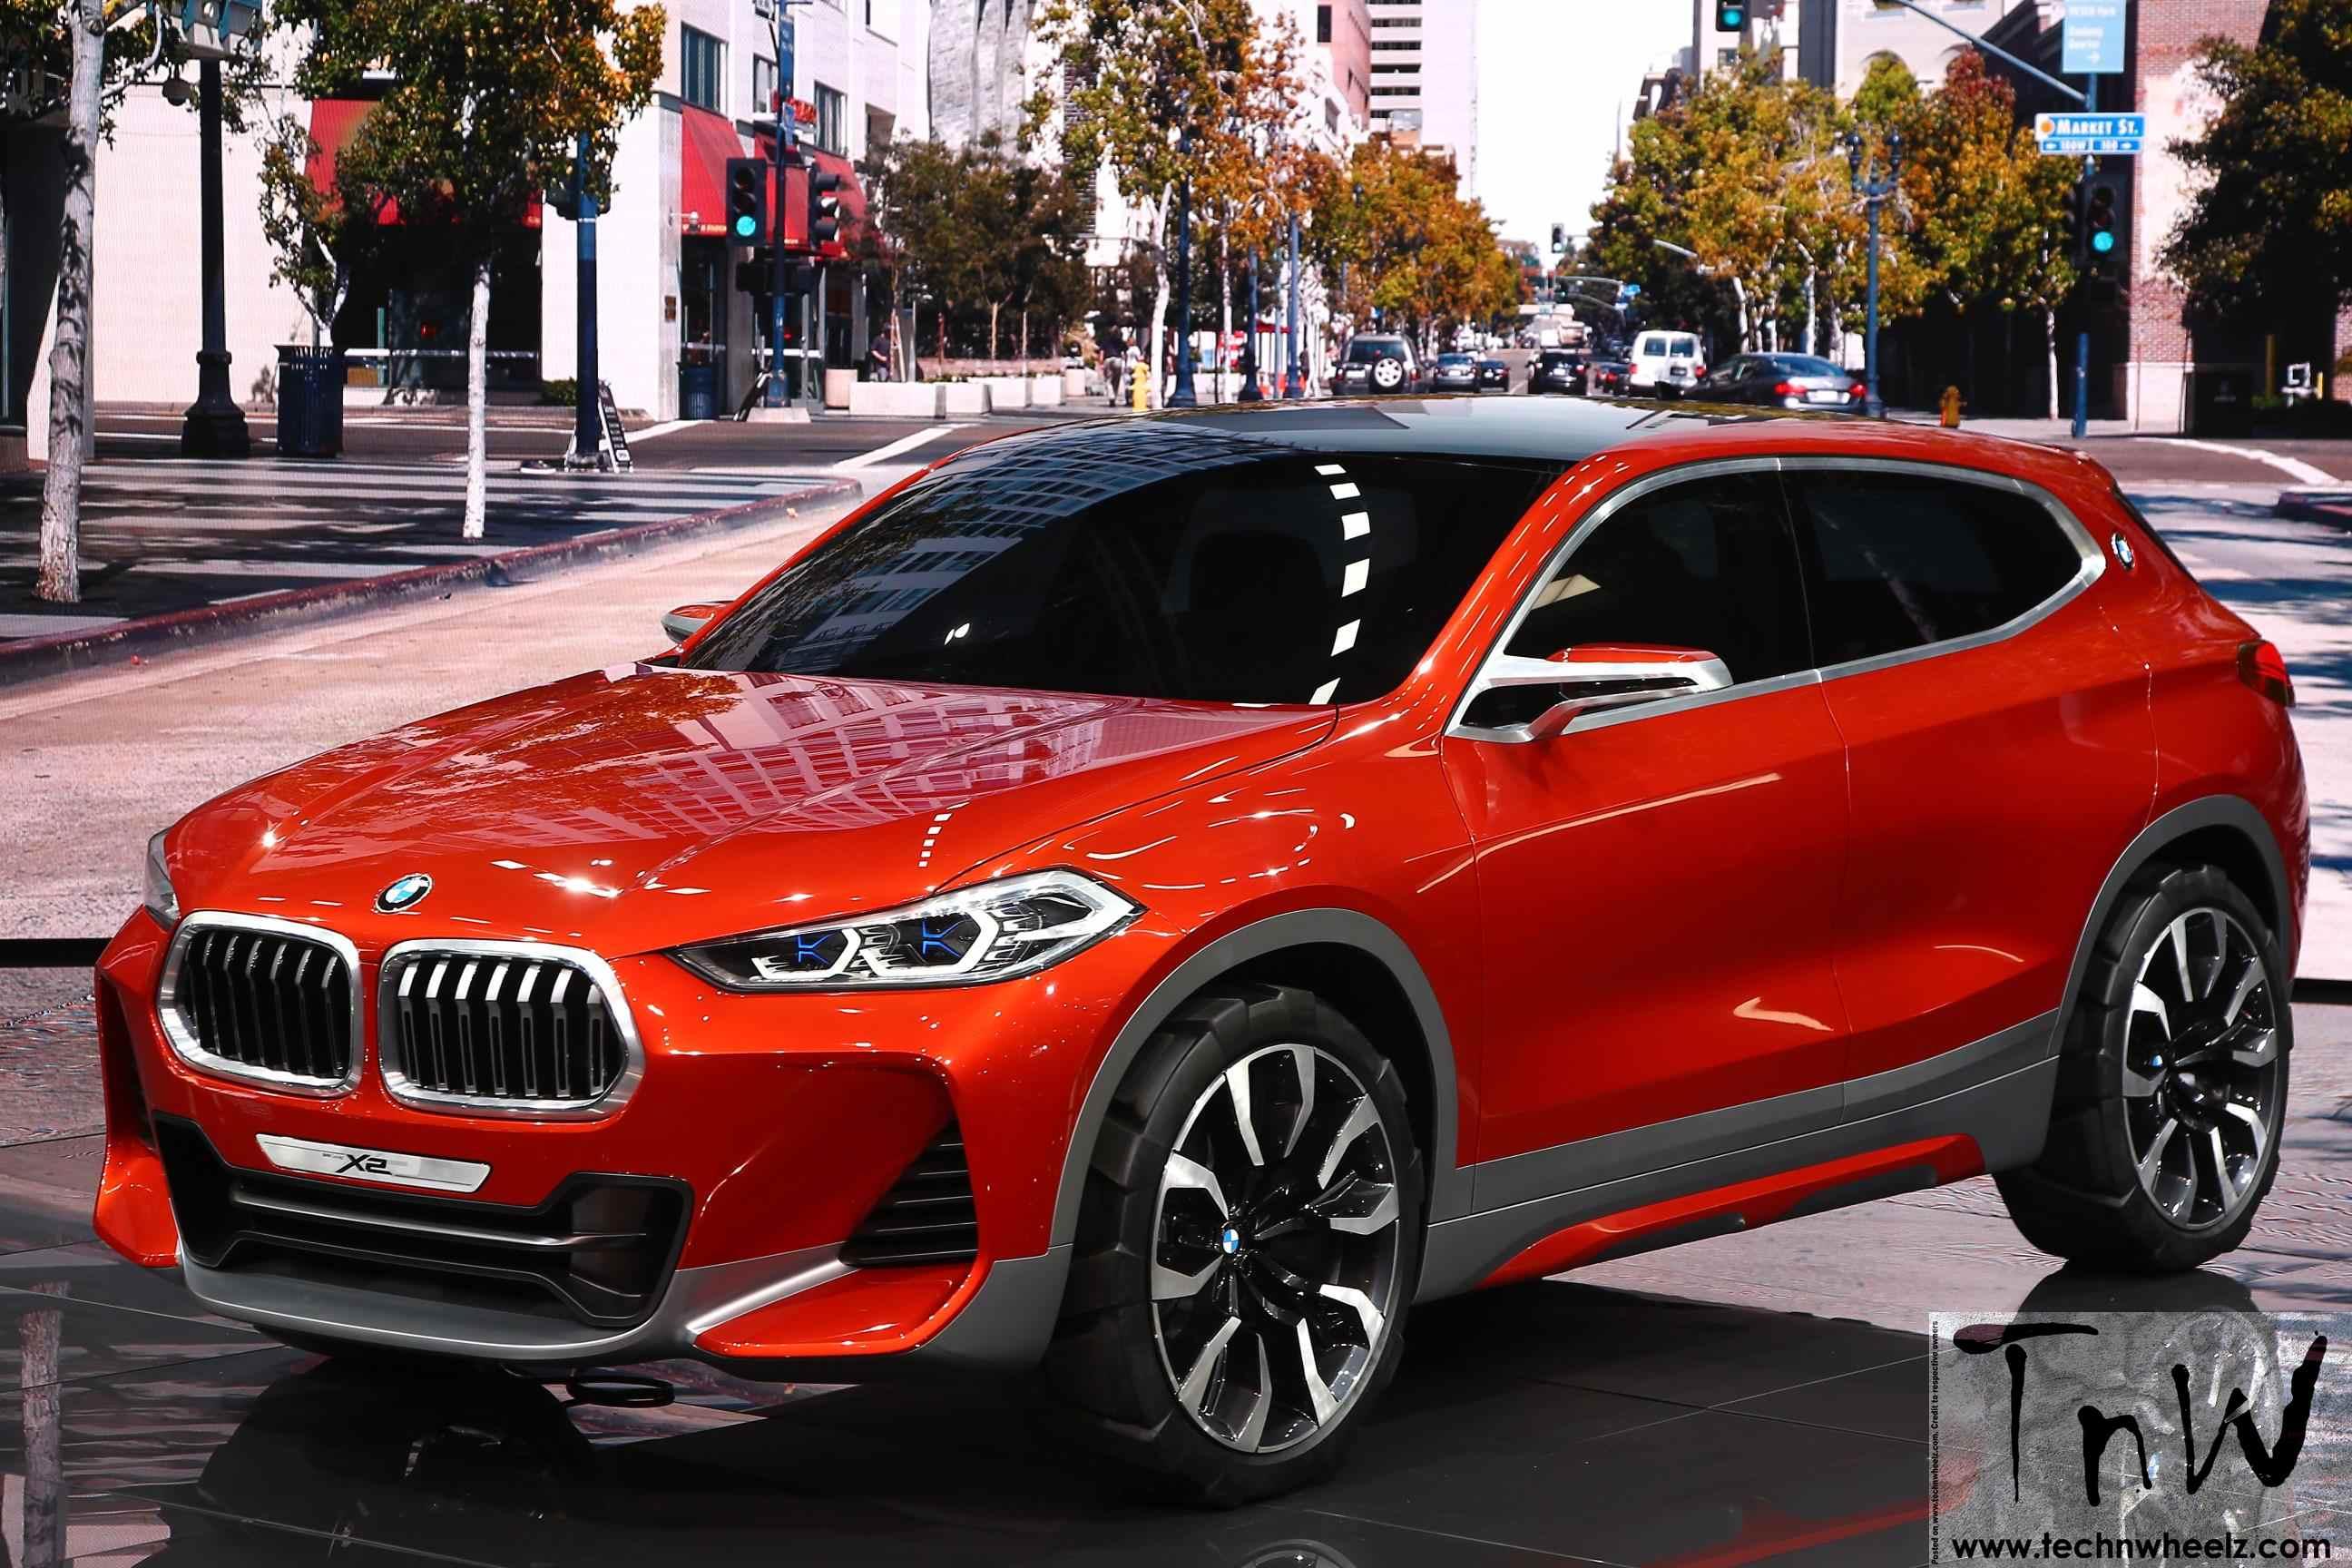 Paris Motor Show: BMW Concept X2 debuts. Breaks design code